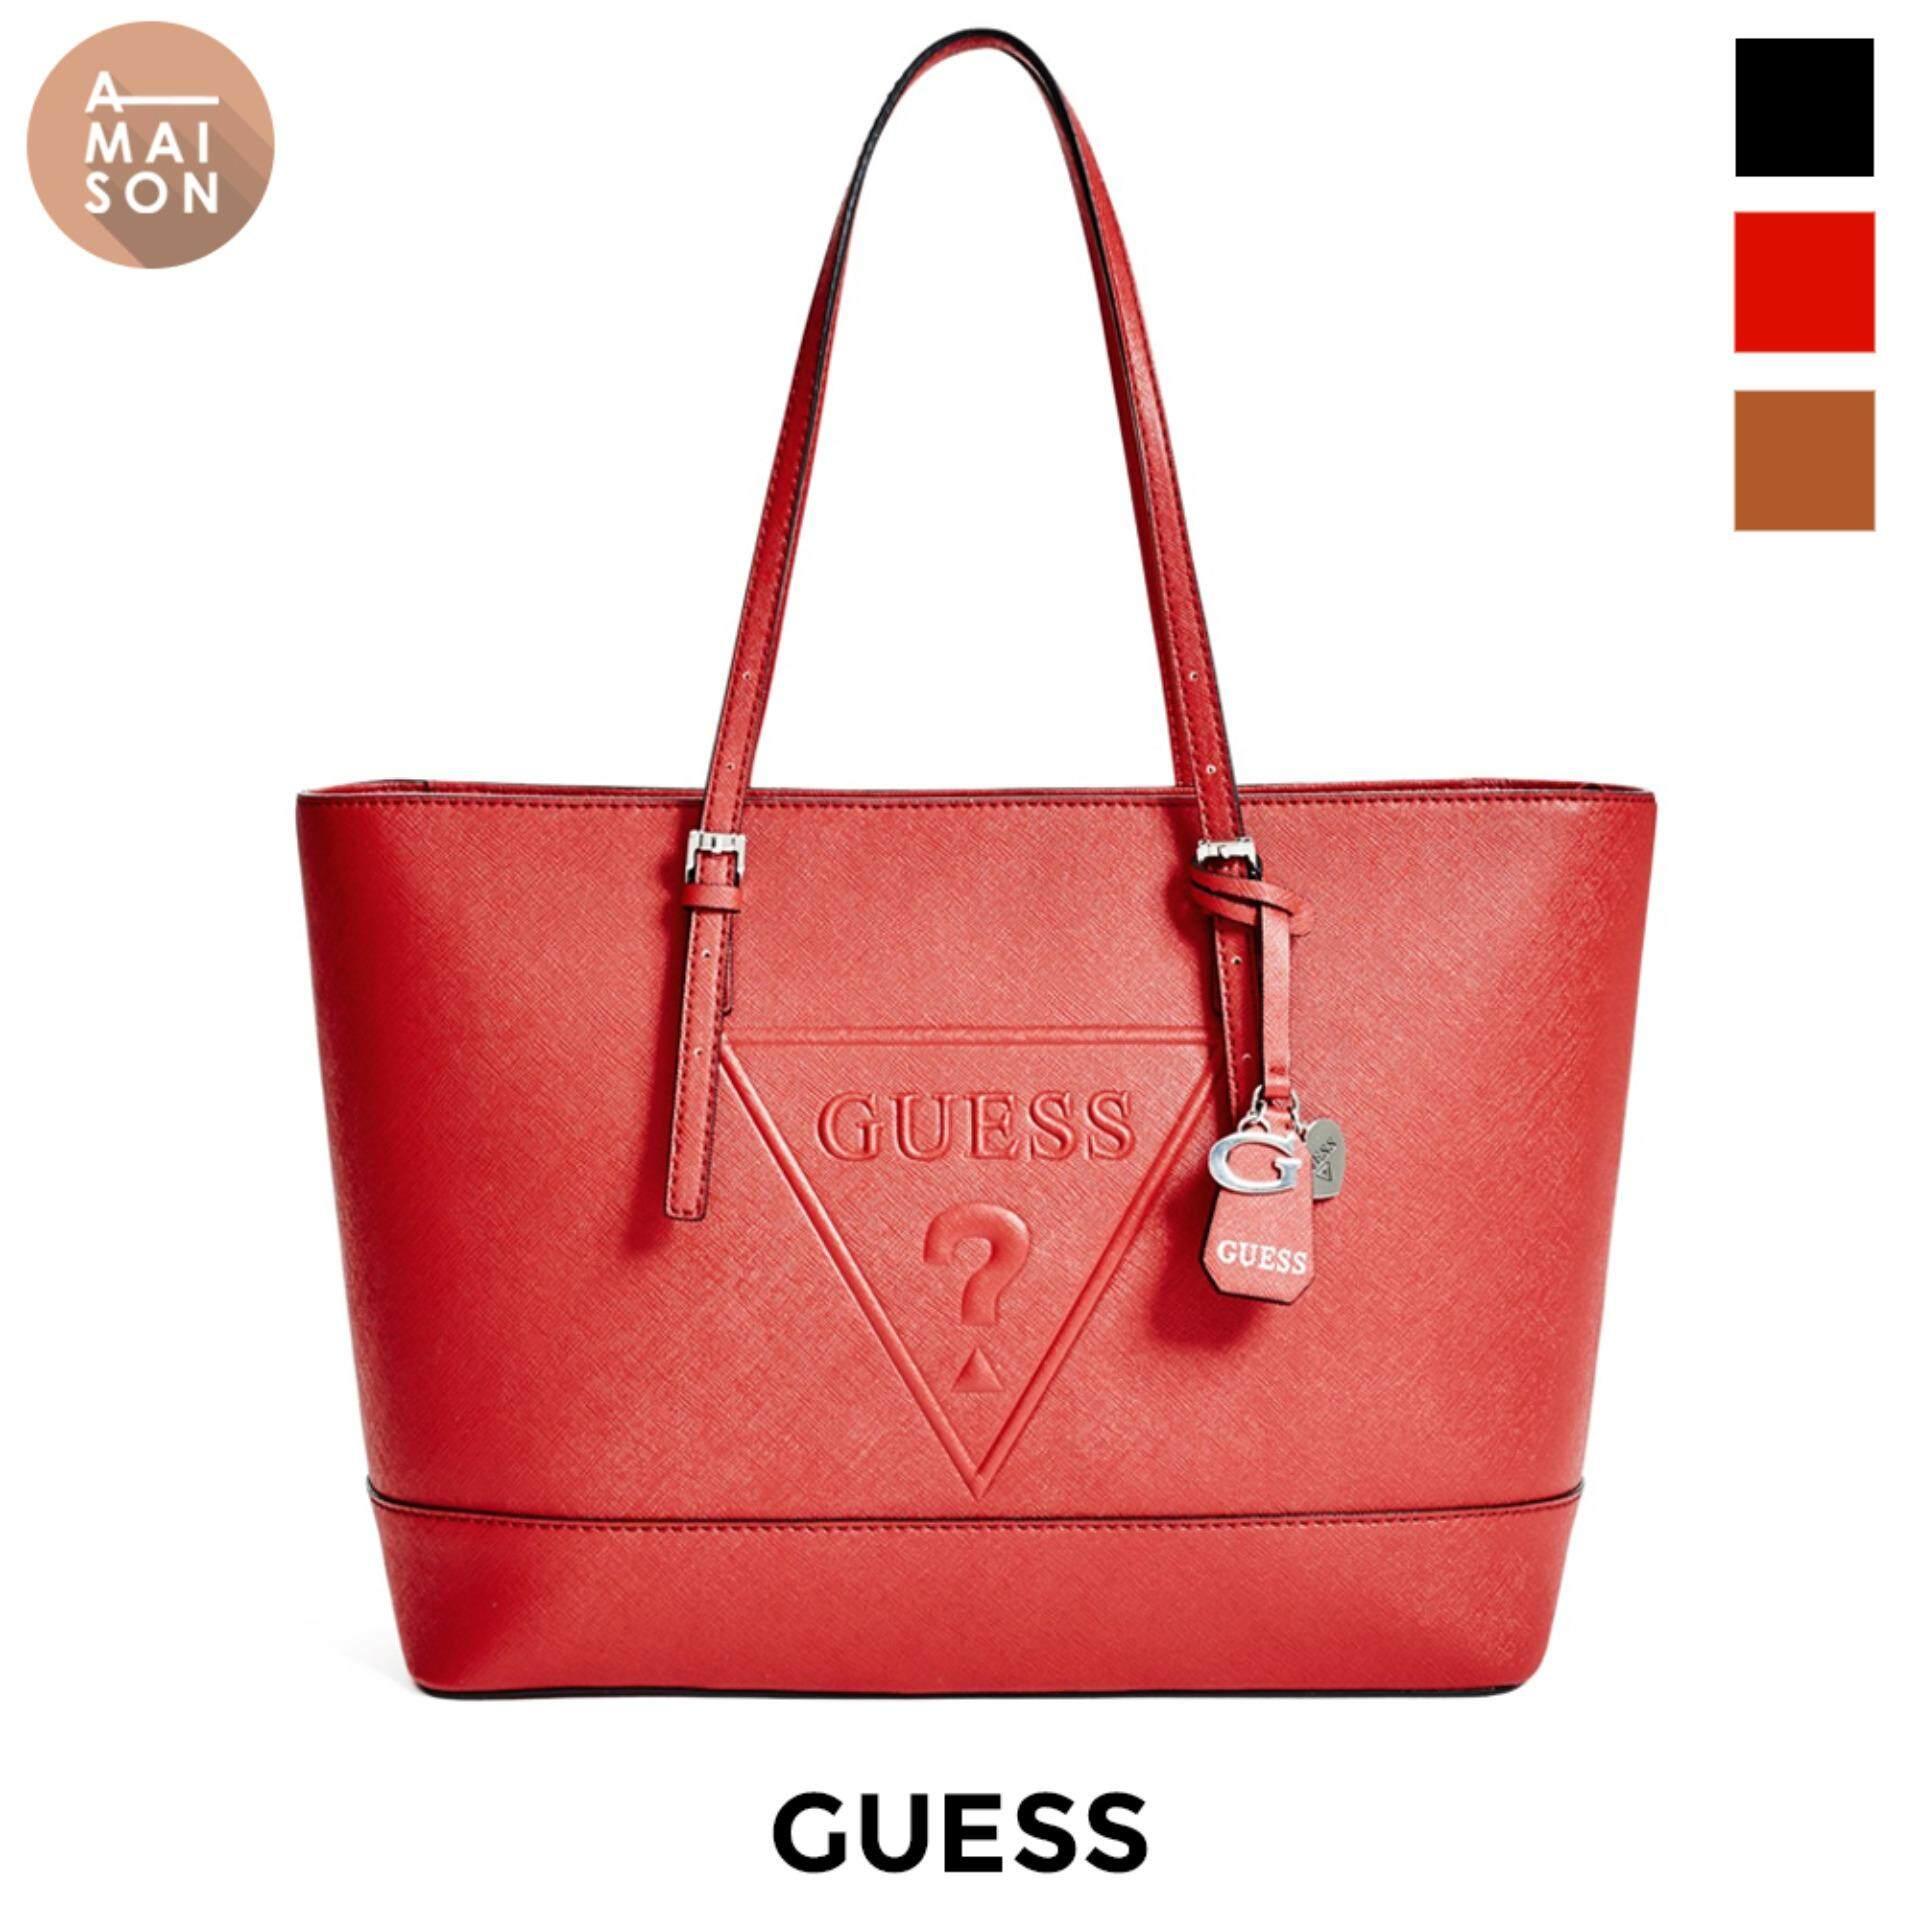 Authentic Guess Peak Embossed Logo Oversized Minimal Handbag Shoulder Tote Bag